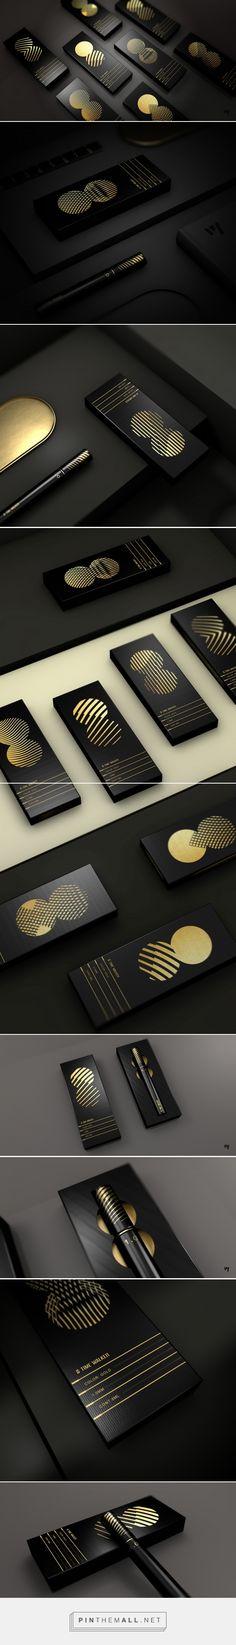 Time Walker Pen packaging design by WingYang - http://www.packagingoftheworld.com/2017/02/time-walker-pen.html